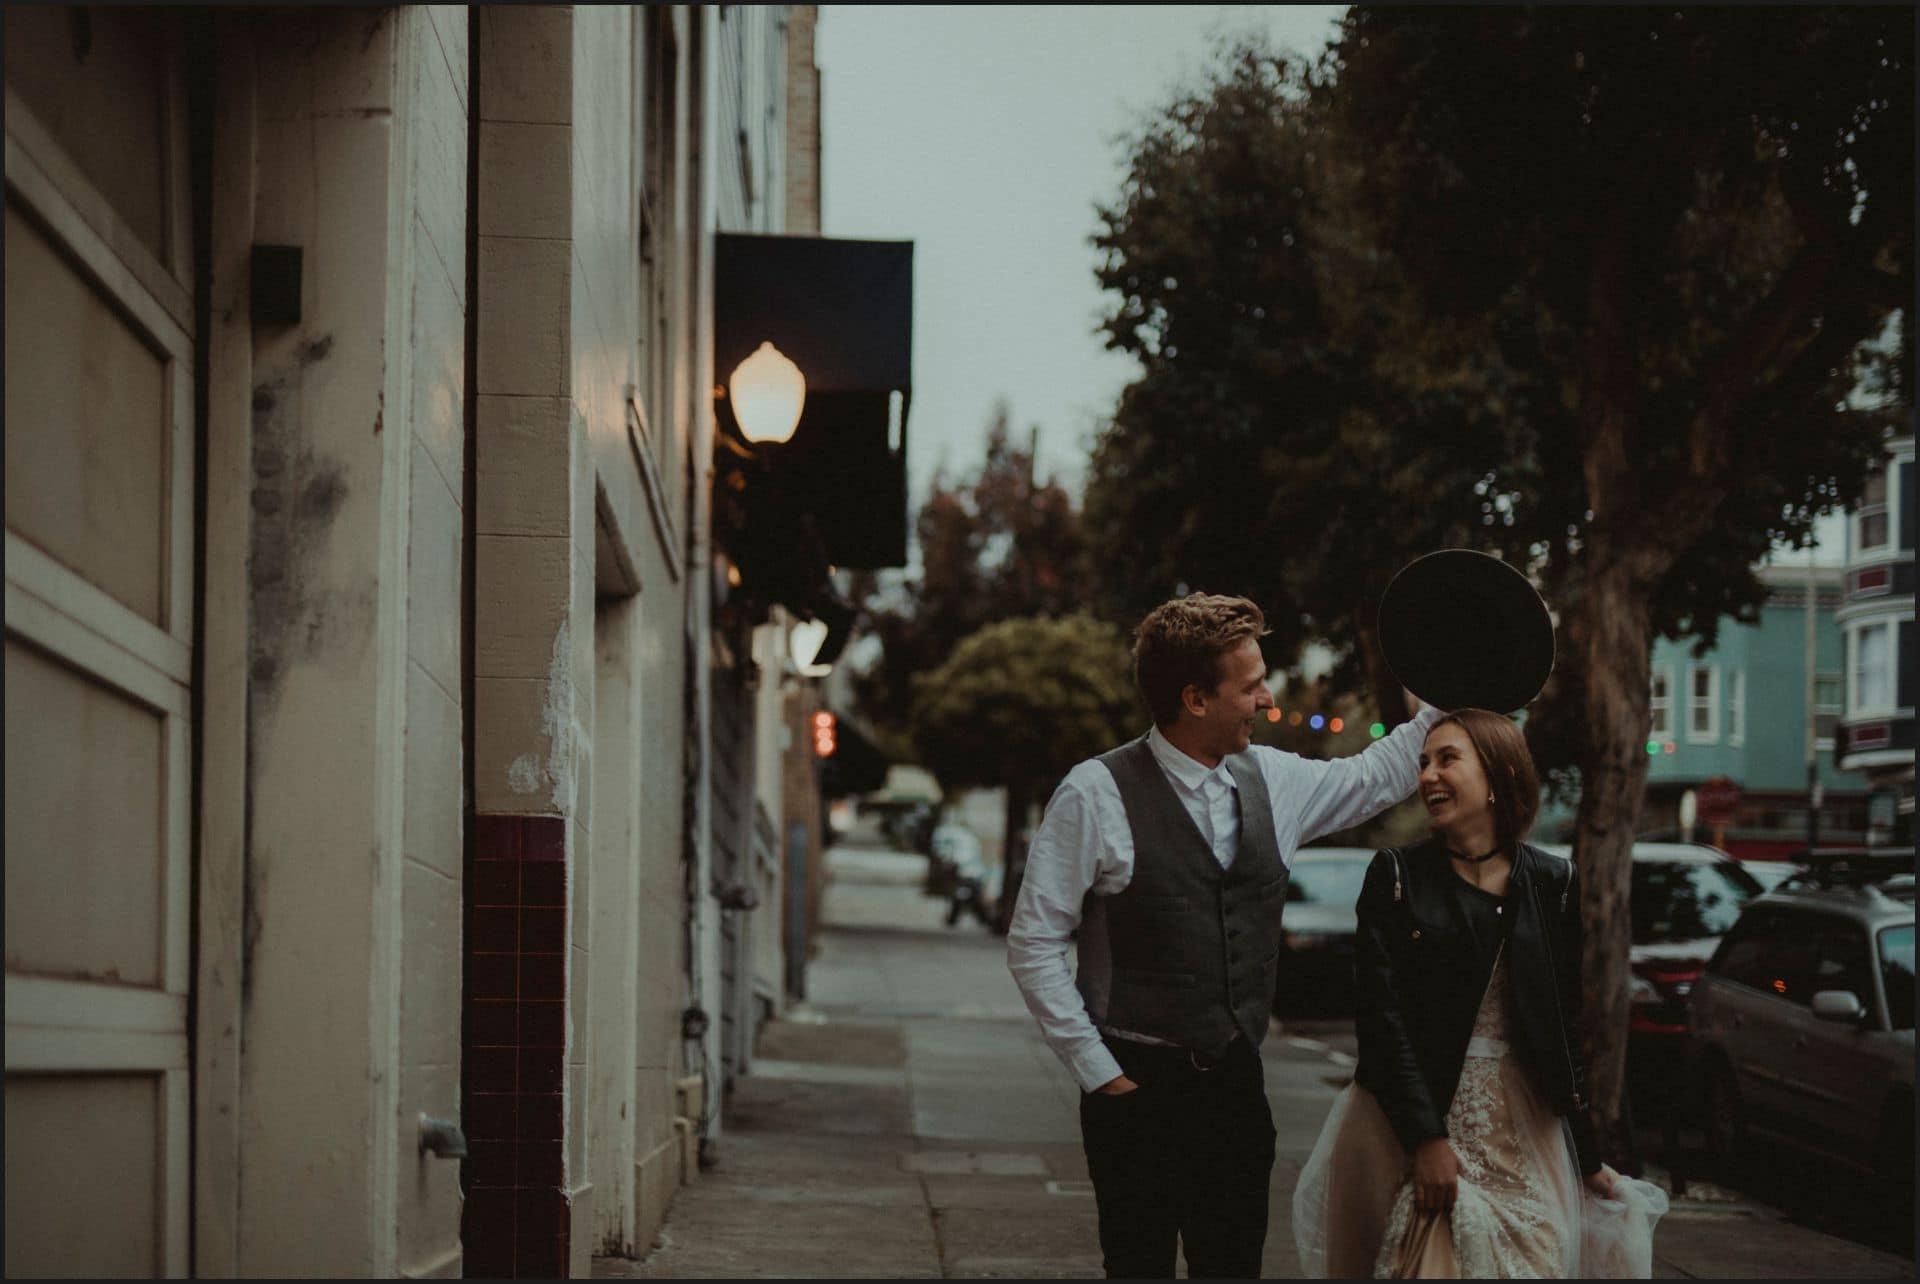 san francisco, california, elopement wedding, hat, bride